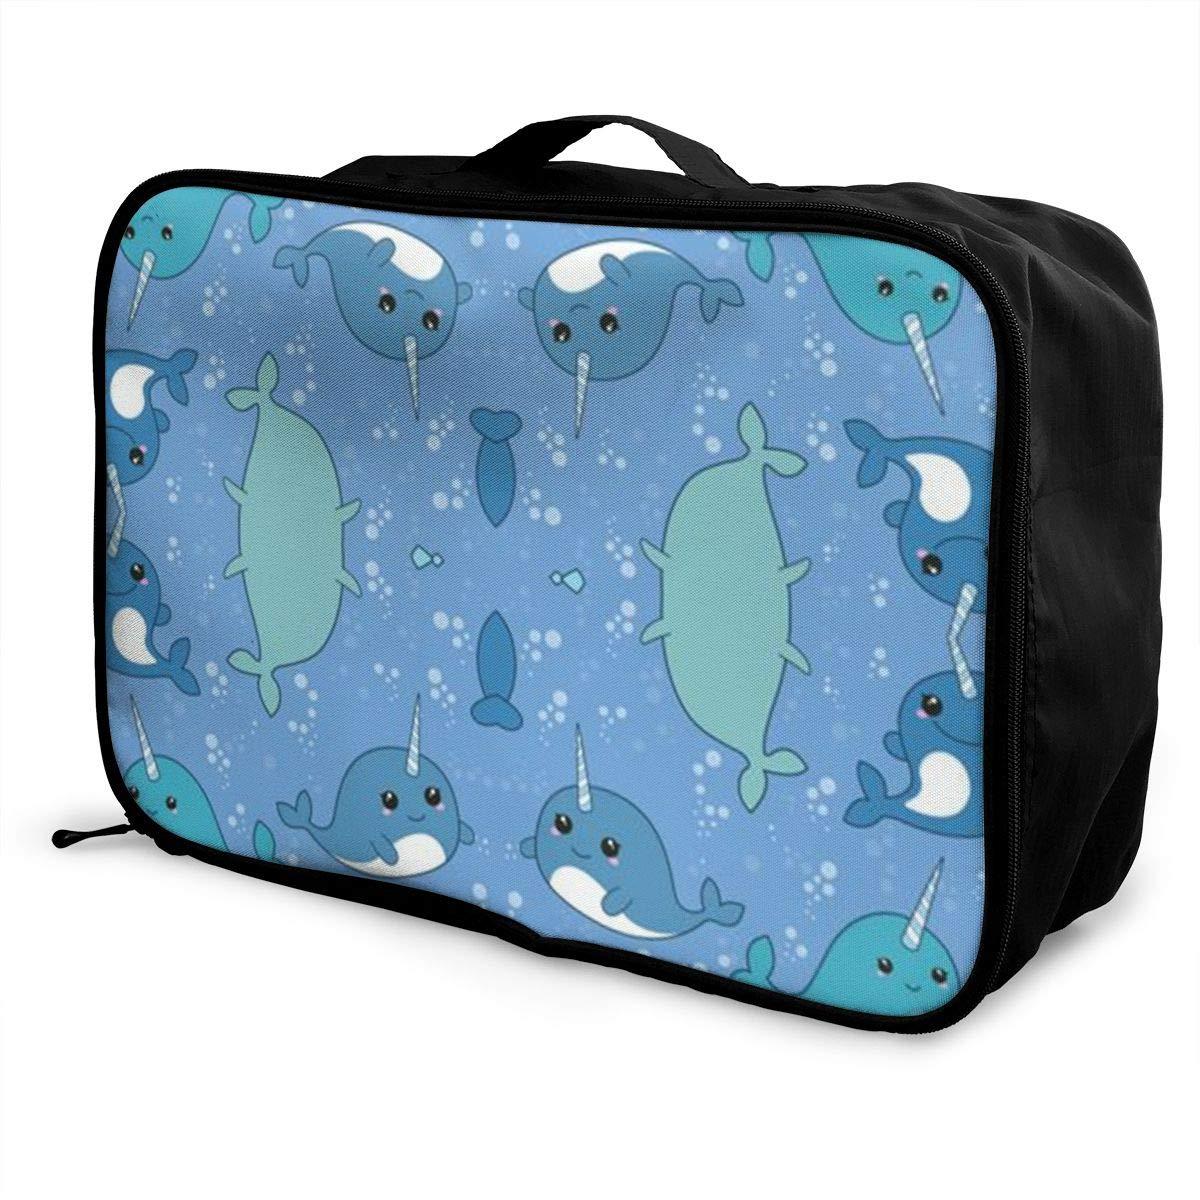 ADGAI Cute Narwhal Pattern Canvas Travel Weekender Bag,Fashion Custom Lightweight Large Capacity Portable Luggage Bag,Suitcase Trolley Bag